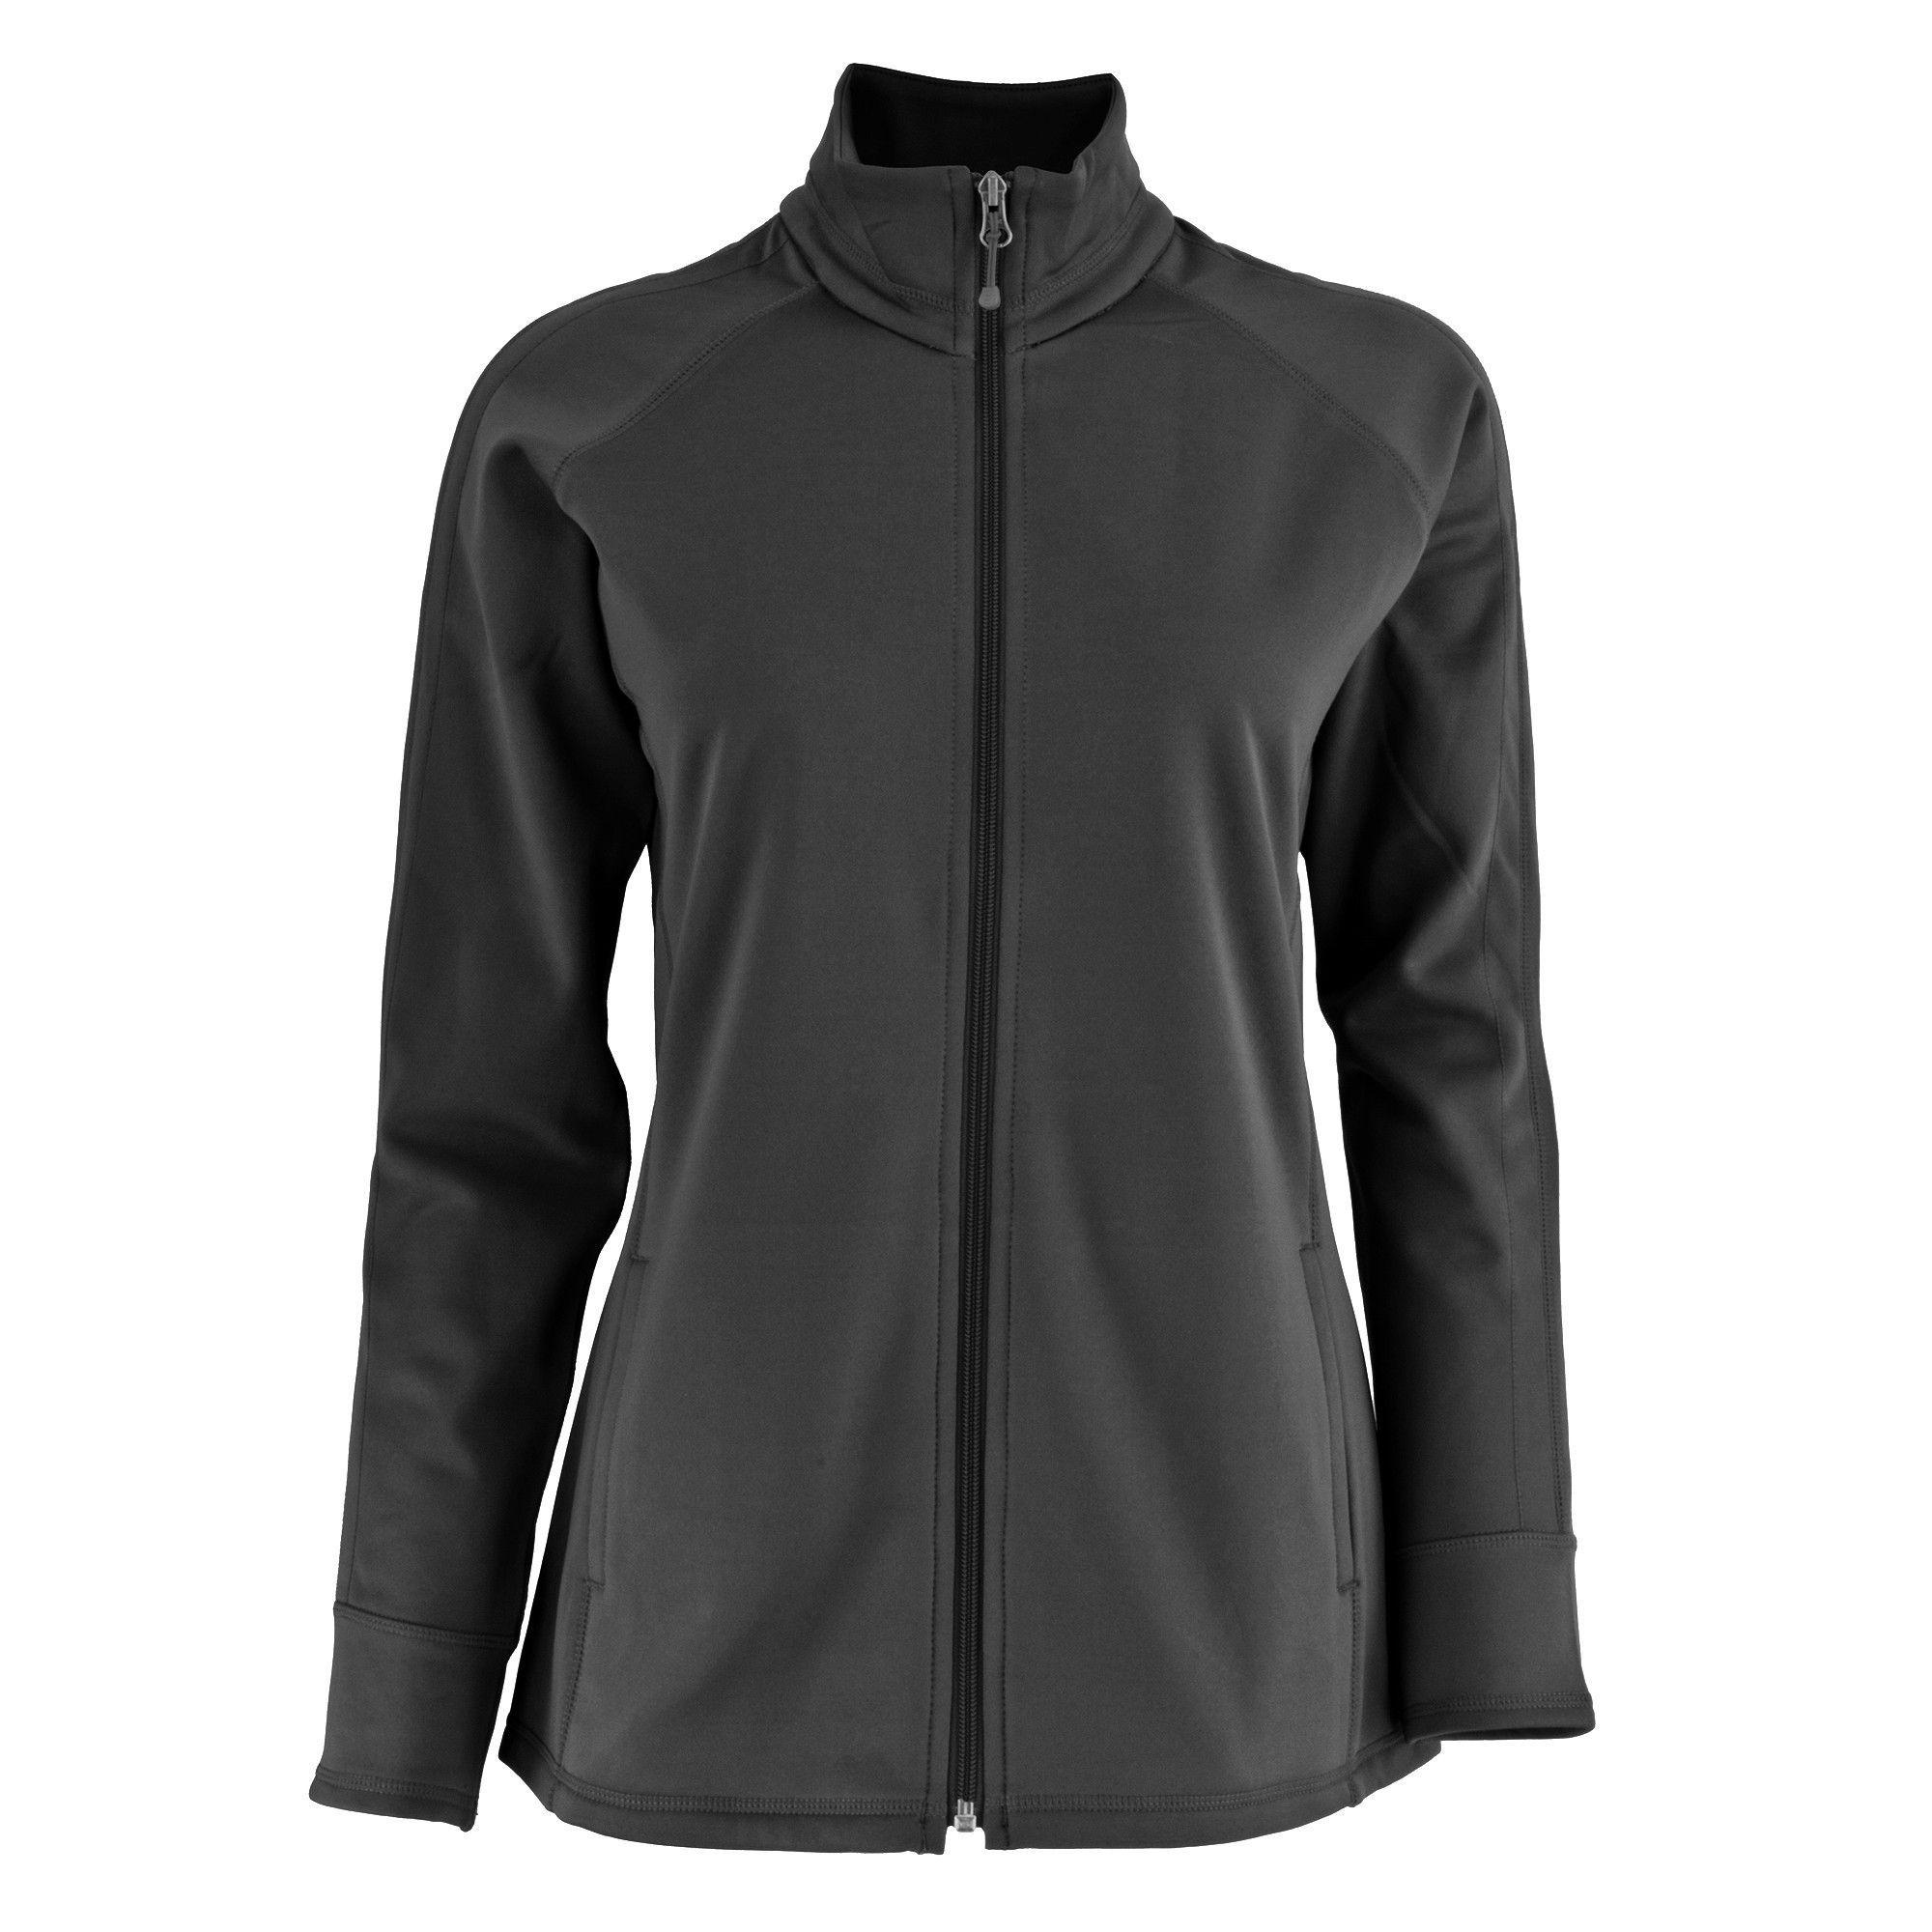 Sierra Stretch II Jacket